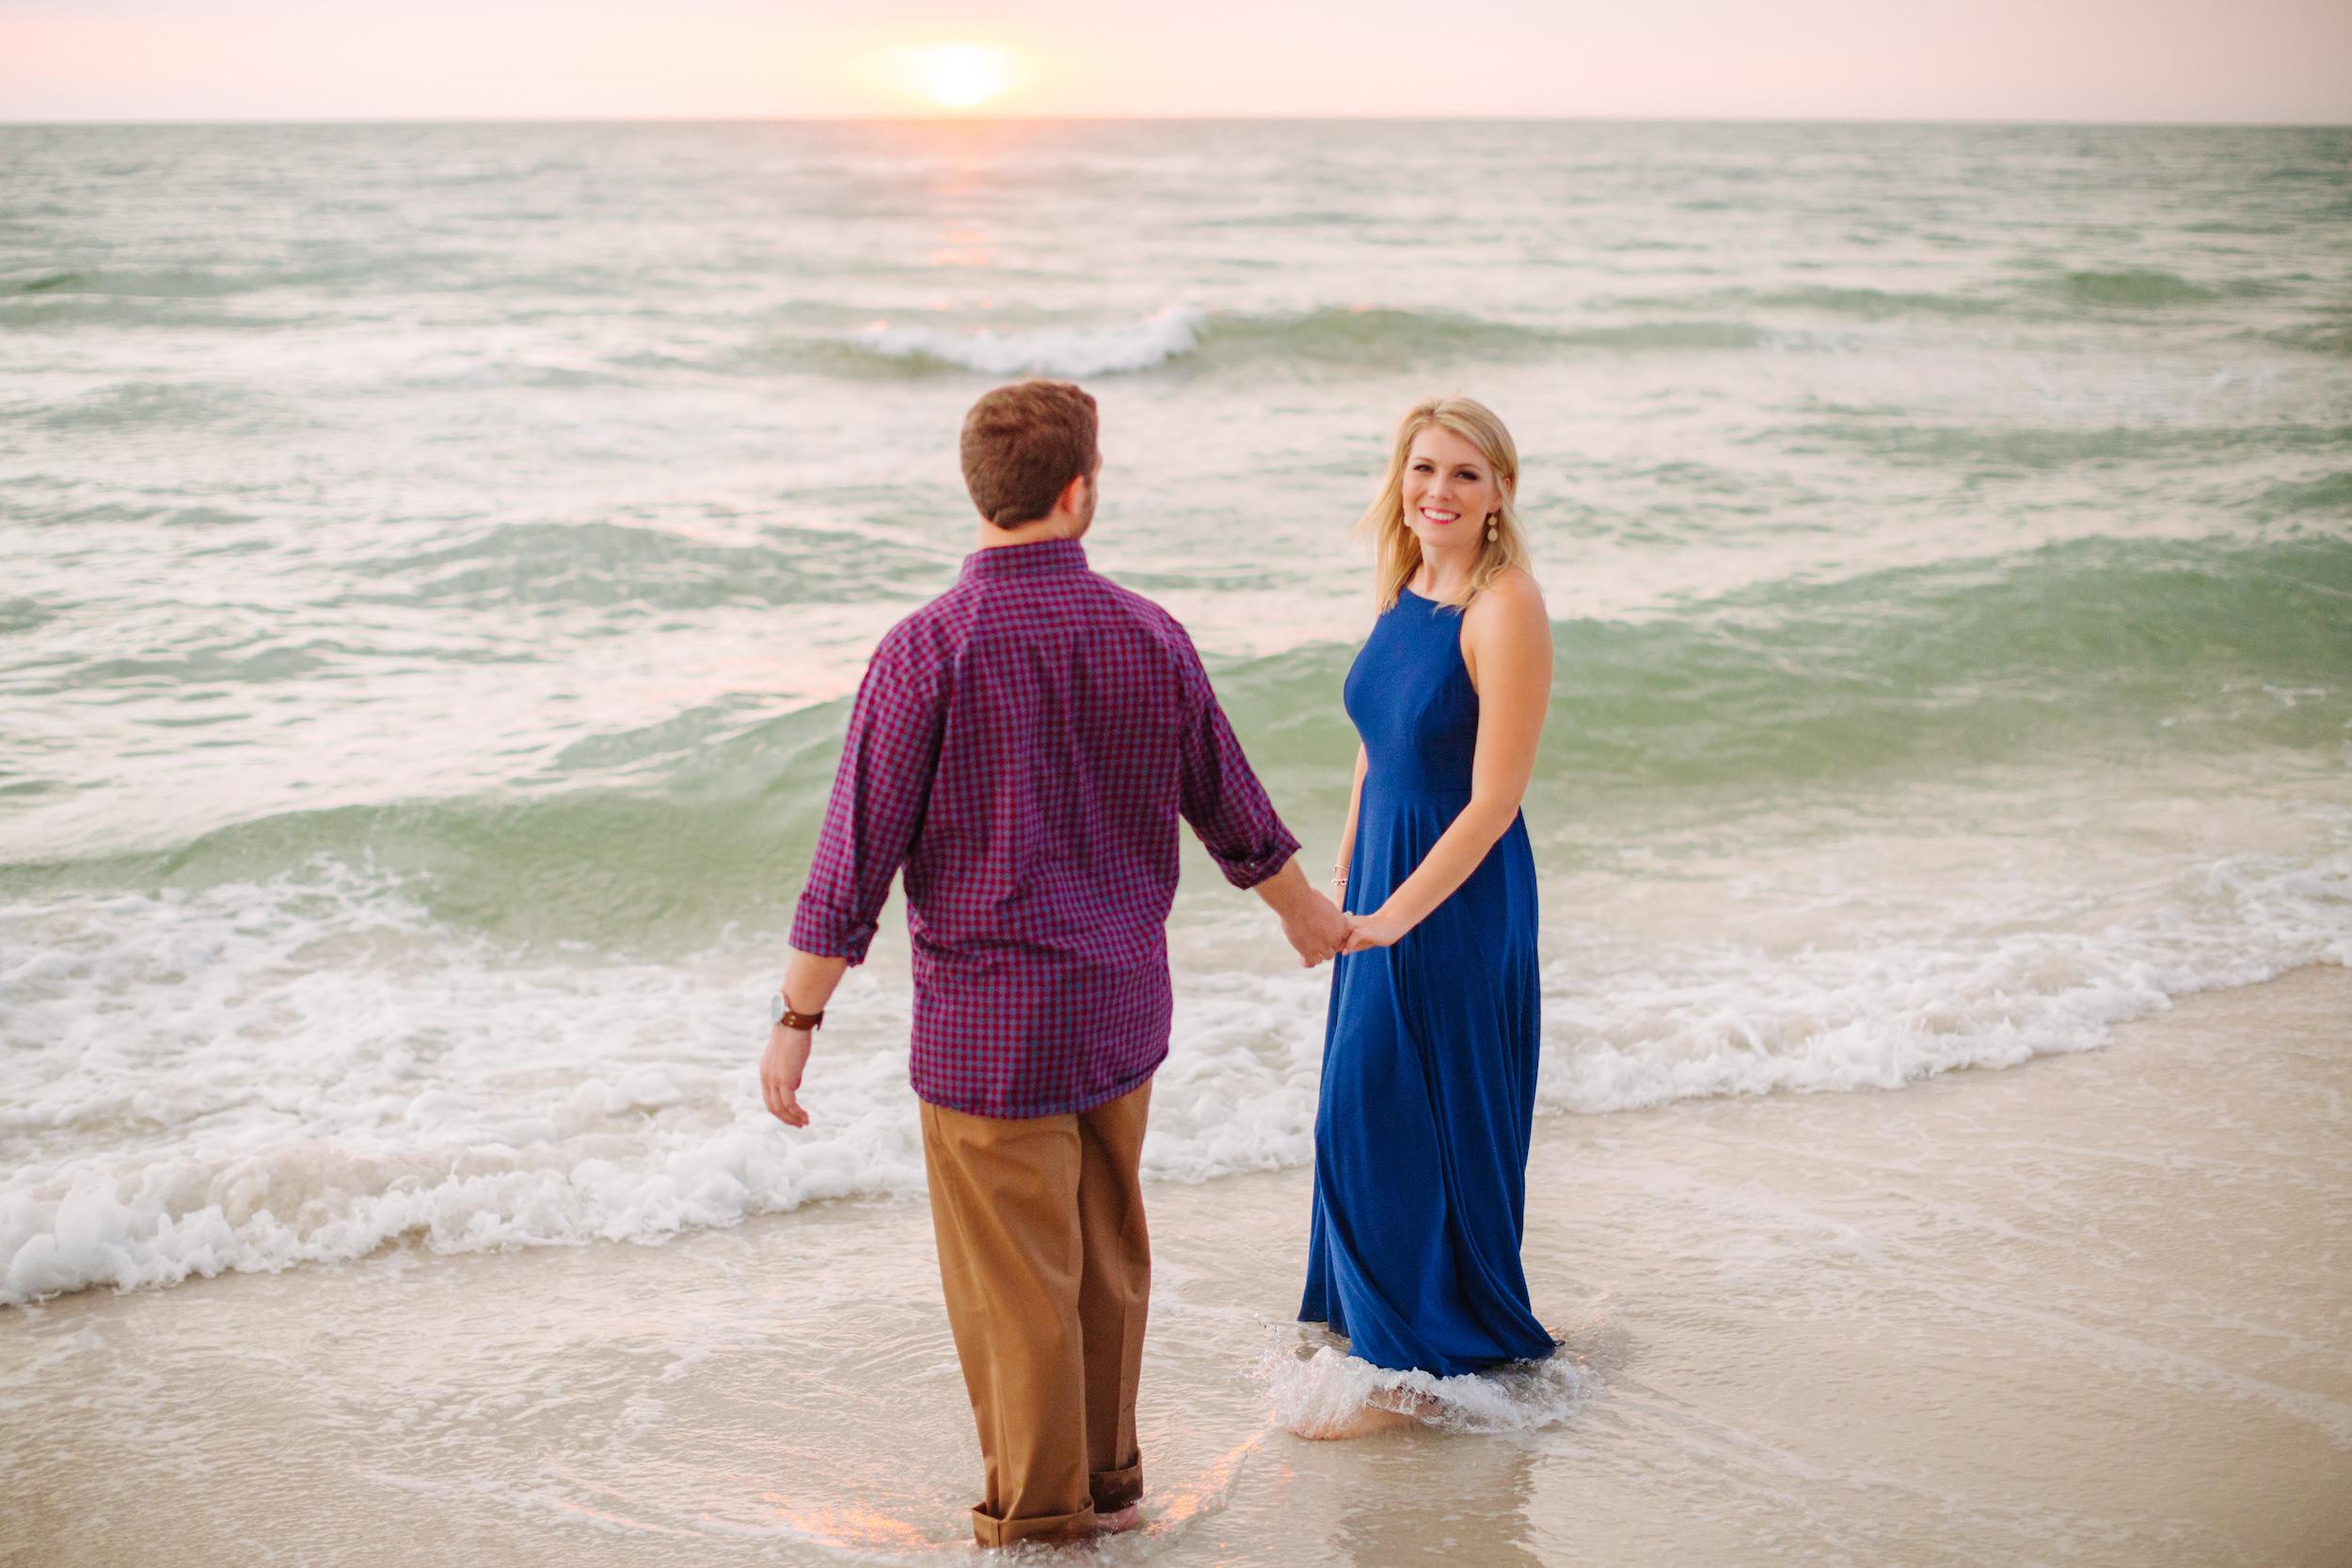 clearwater beach sunset engagement photos-021.jpg